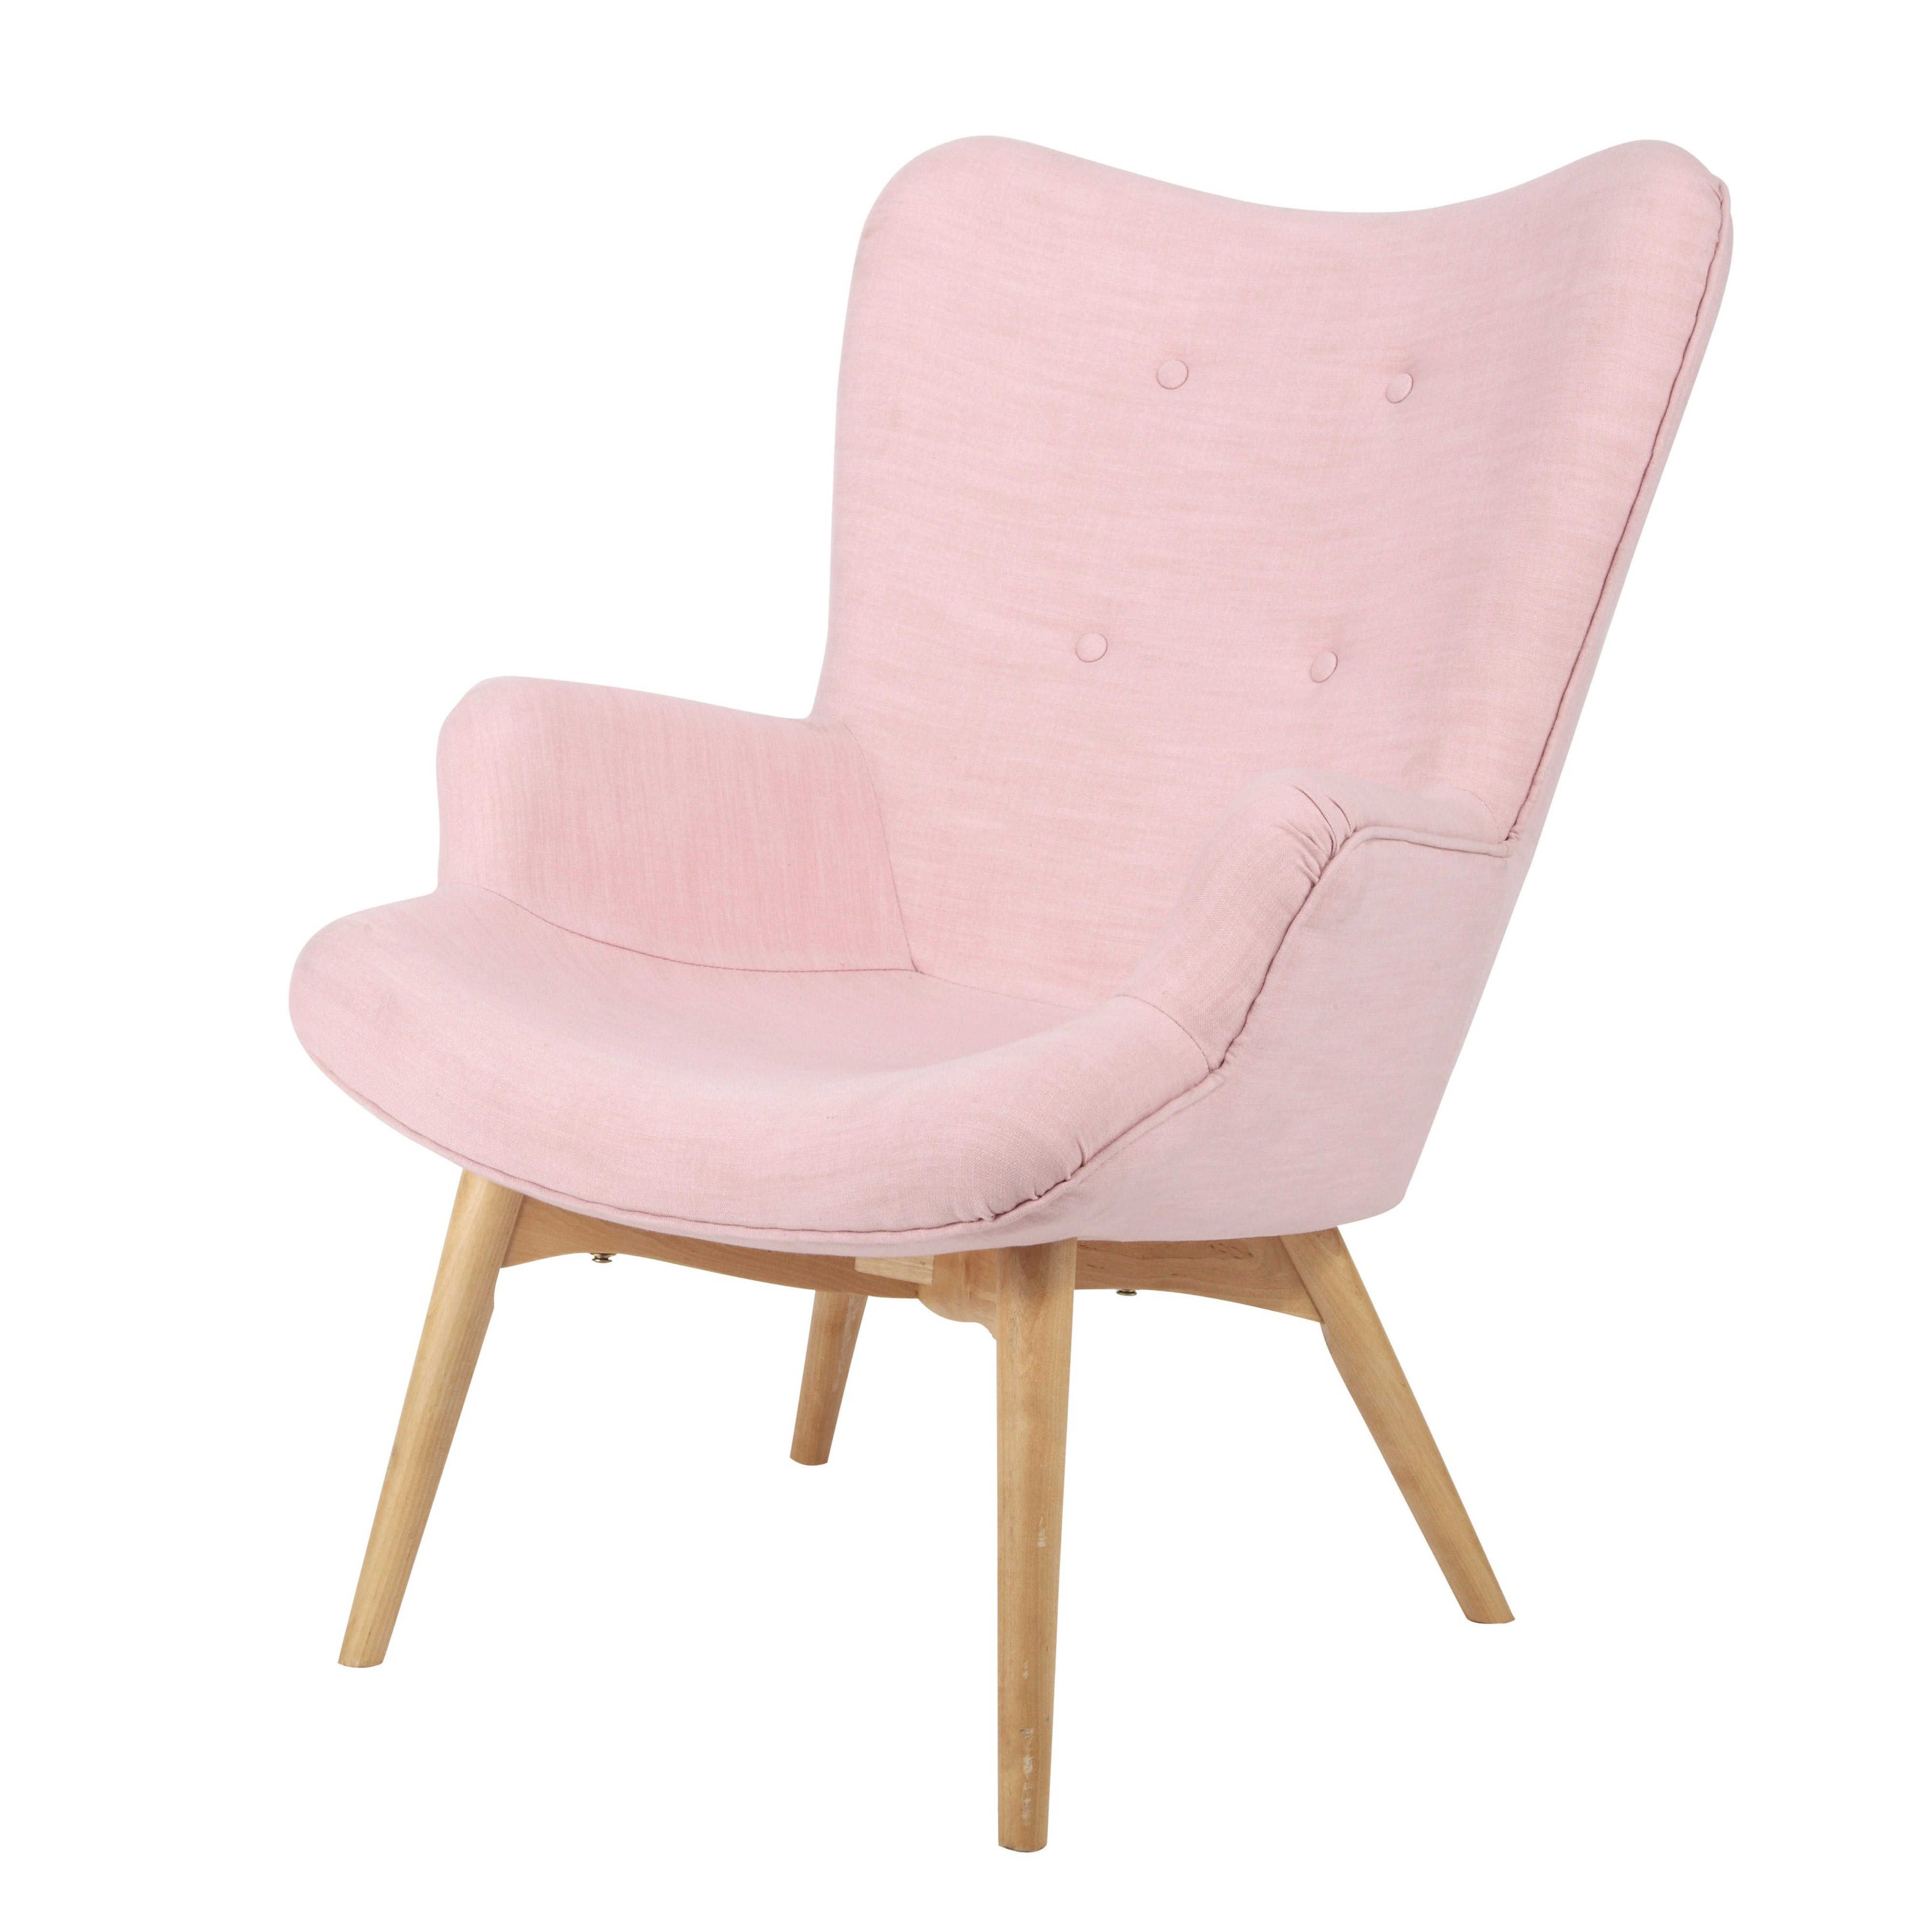 sessel pastell rosa williamflooring. Black Bedroom Furniture Sets. Home Design Ideas